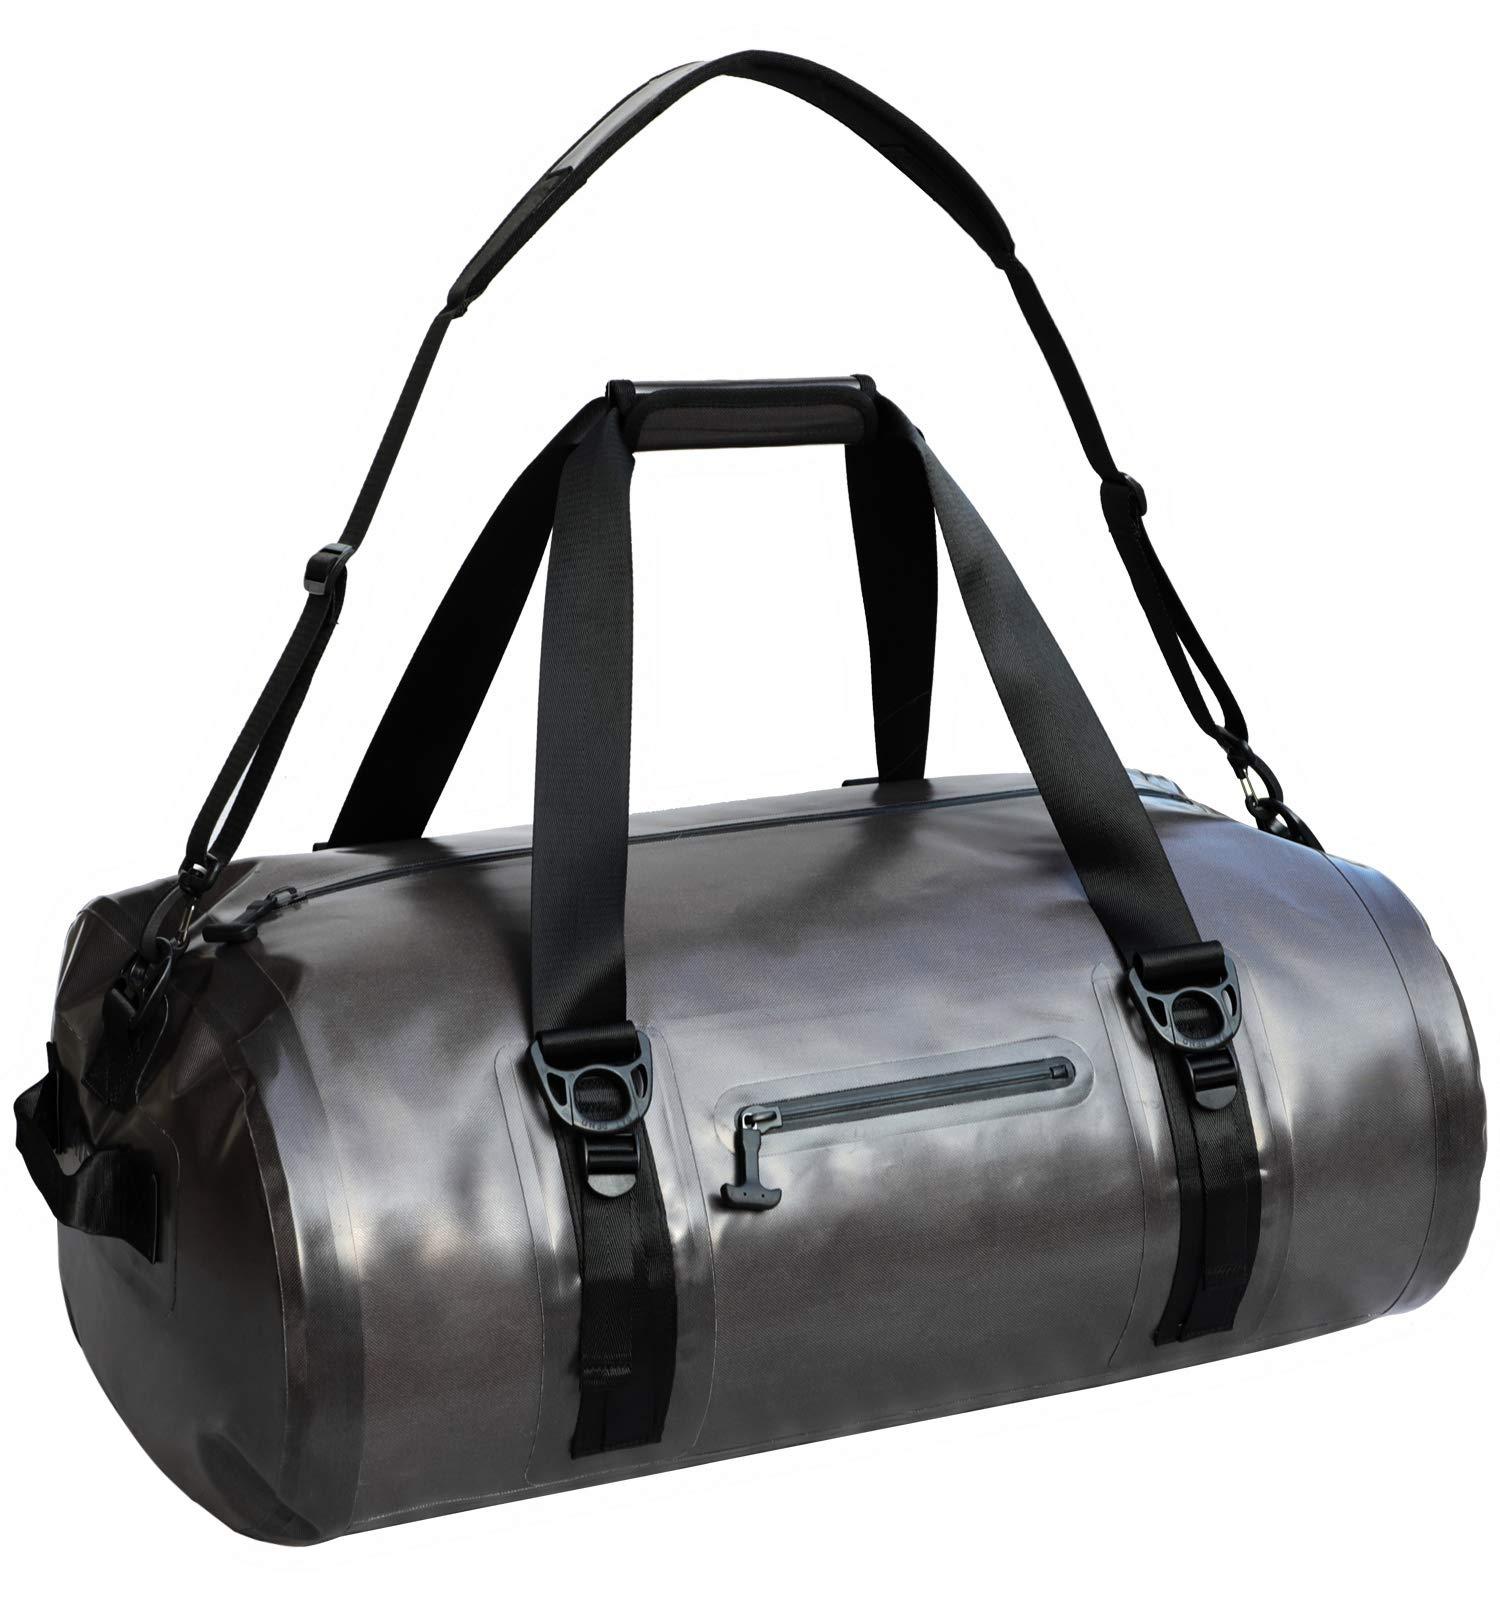 MIER Waterproof Duffel Bag Airtight Dry Bag for Kayaking, Boating, Beach, Rafting, Motorcycle, Travel, Hiking, Camping, Outdoor Adventure, 90L, Dark Grey by MIER